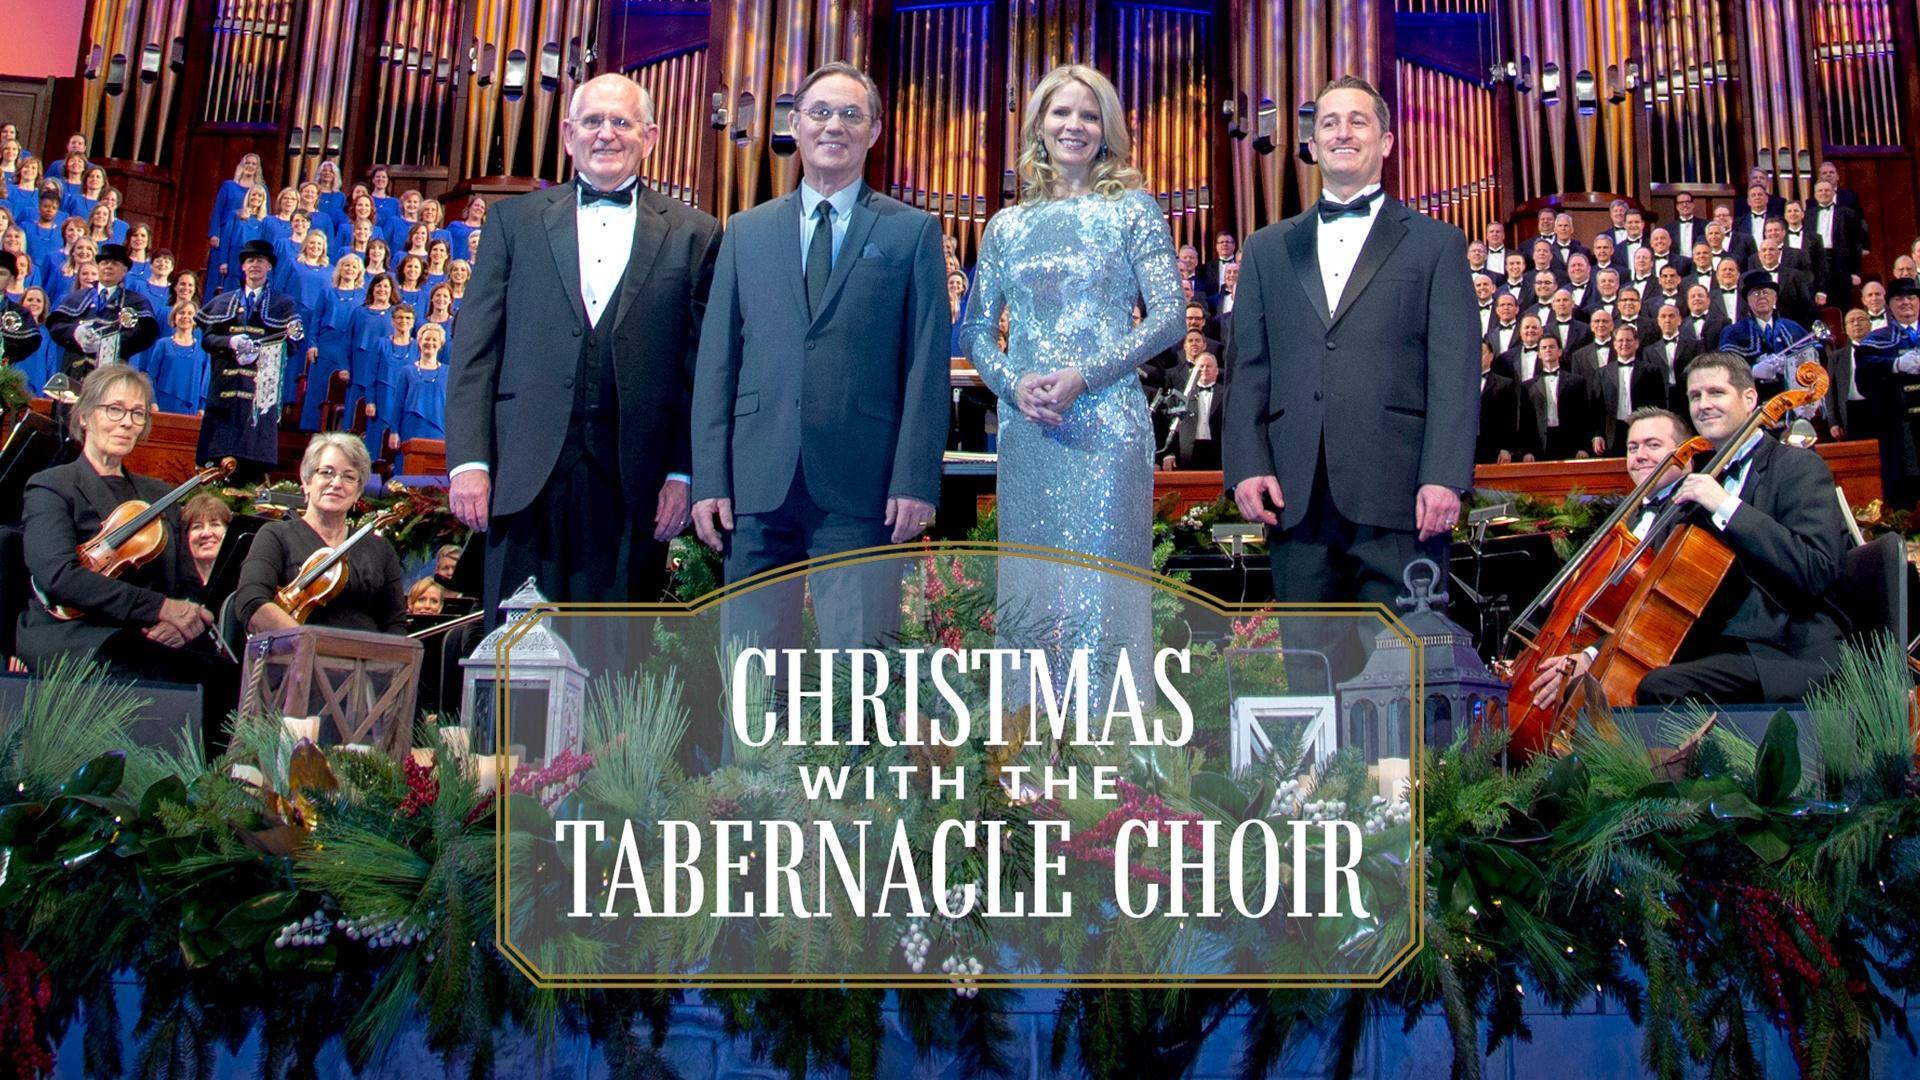 Pbs Christmas Specials 2021 Tis The Season For Pbs Holiday Programs